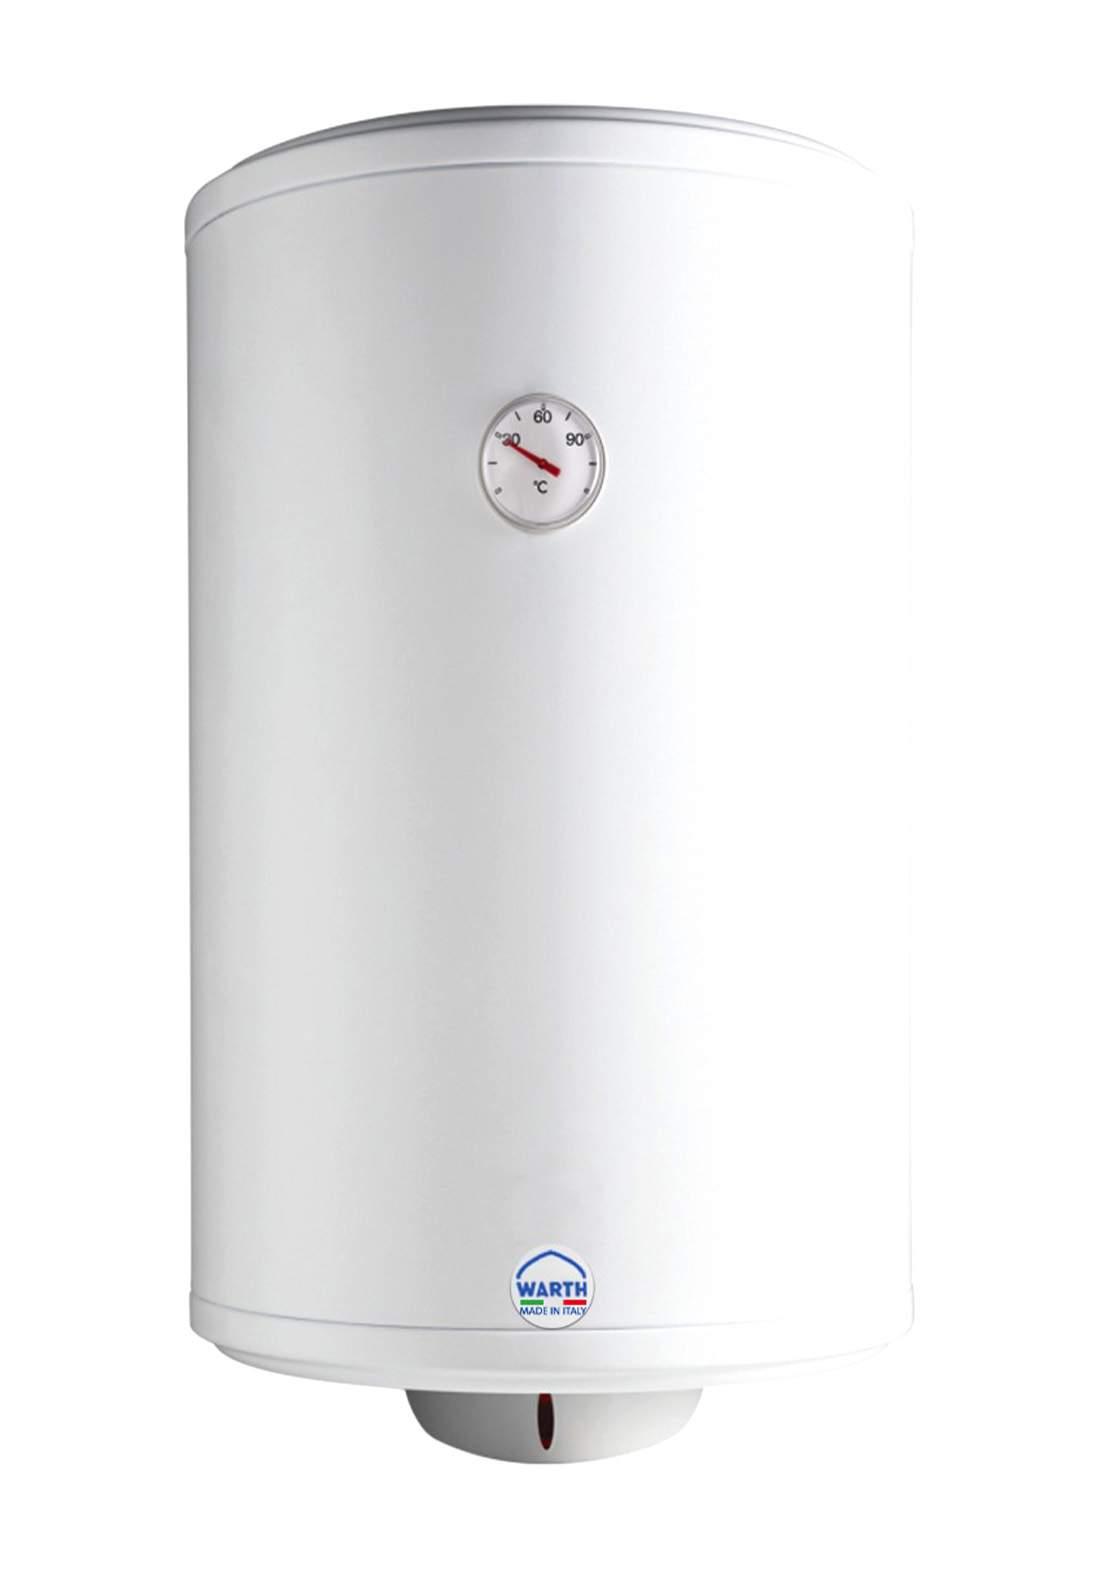 Warth WH-100 Water Heater سخان المياه 100 لتر